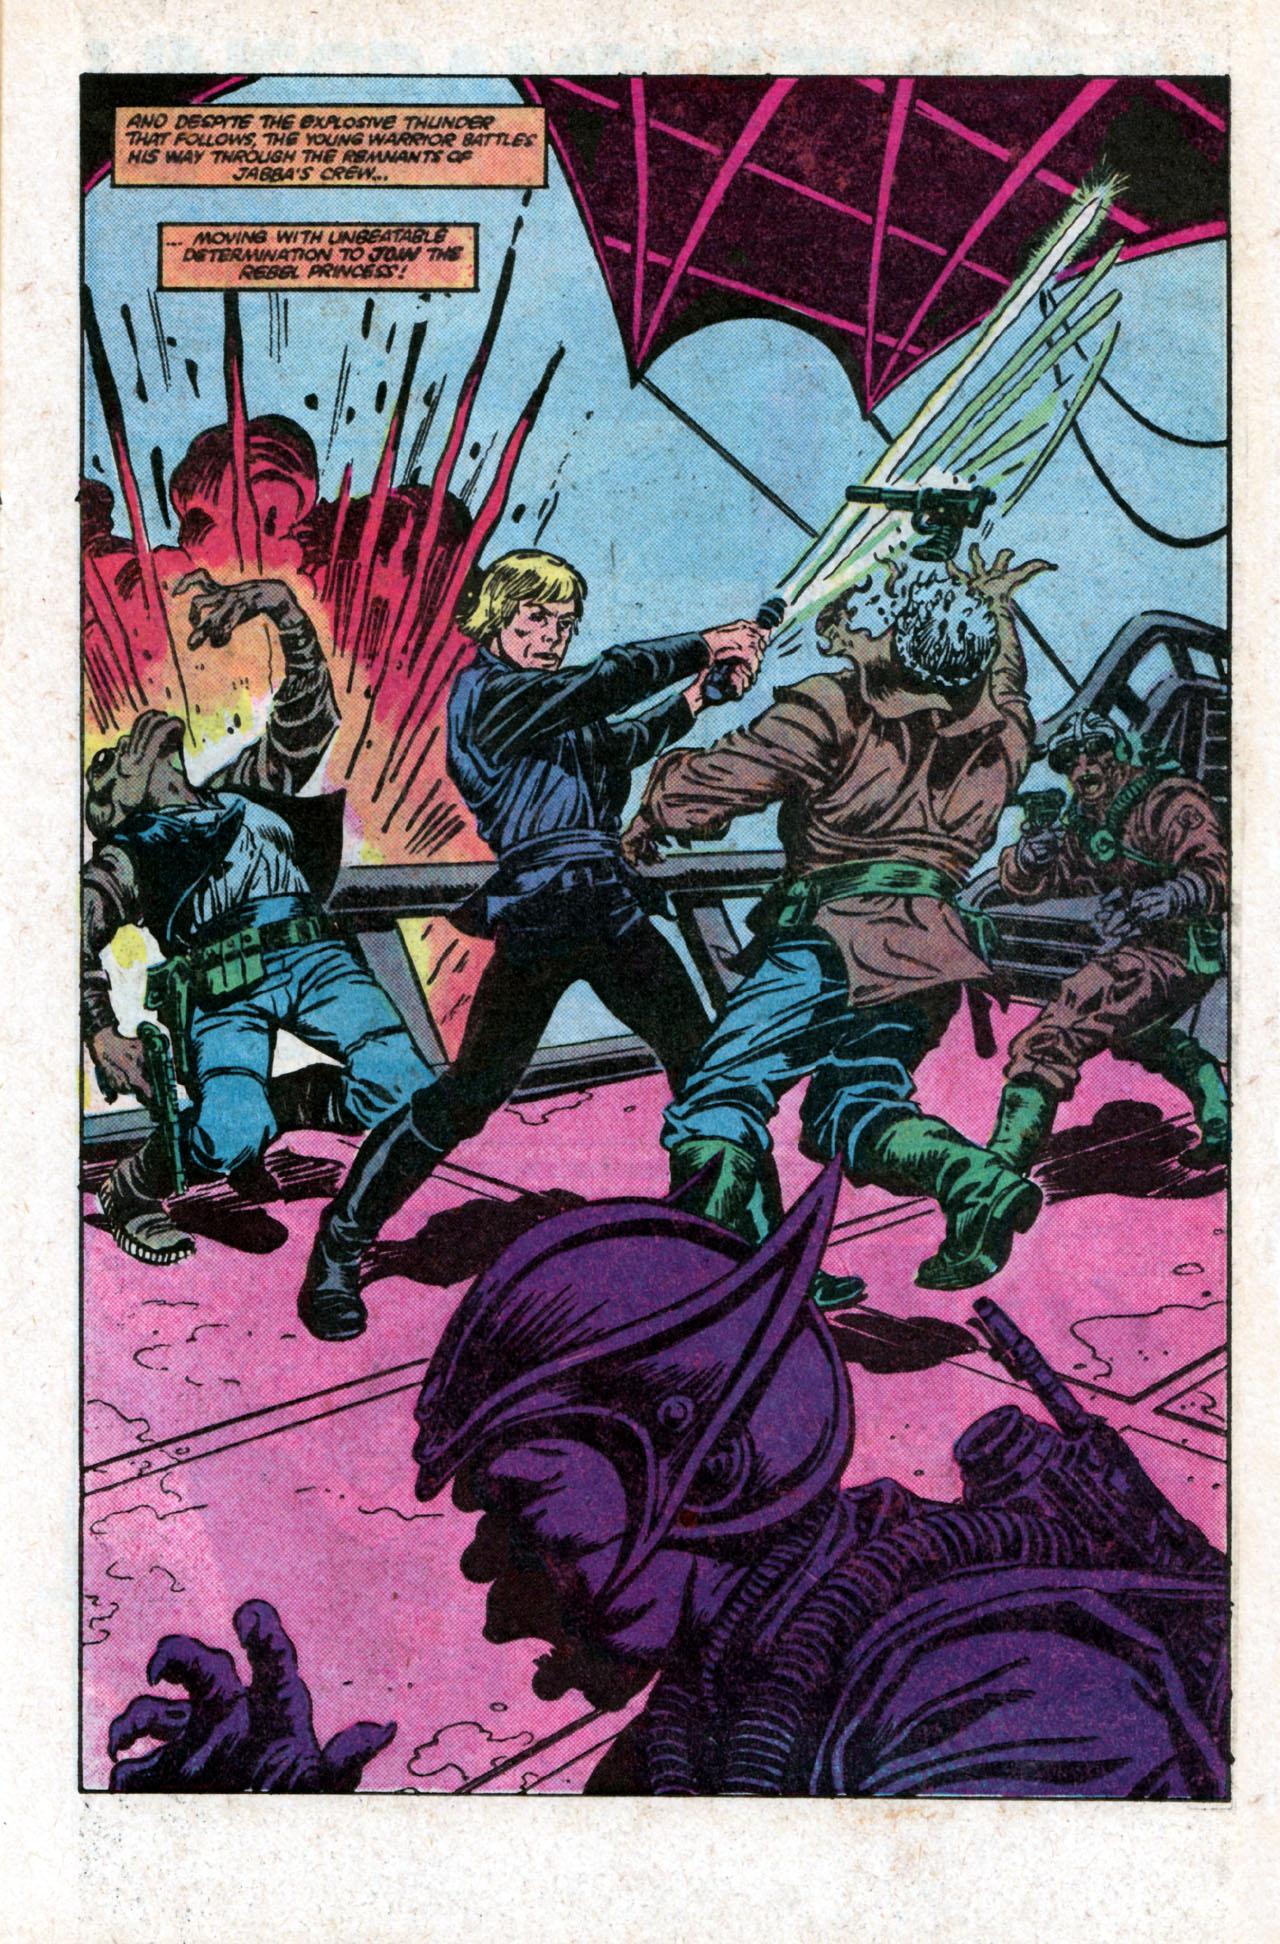 Read online Star Wars: Return of the Jedi comic -  Issue #2 - 13